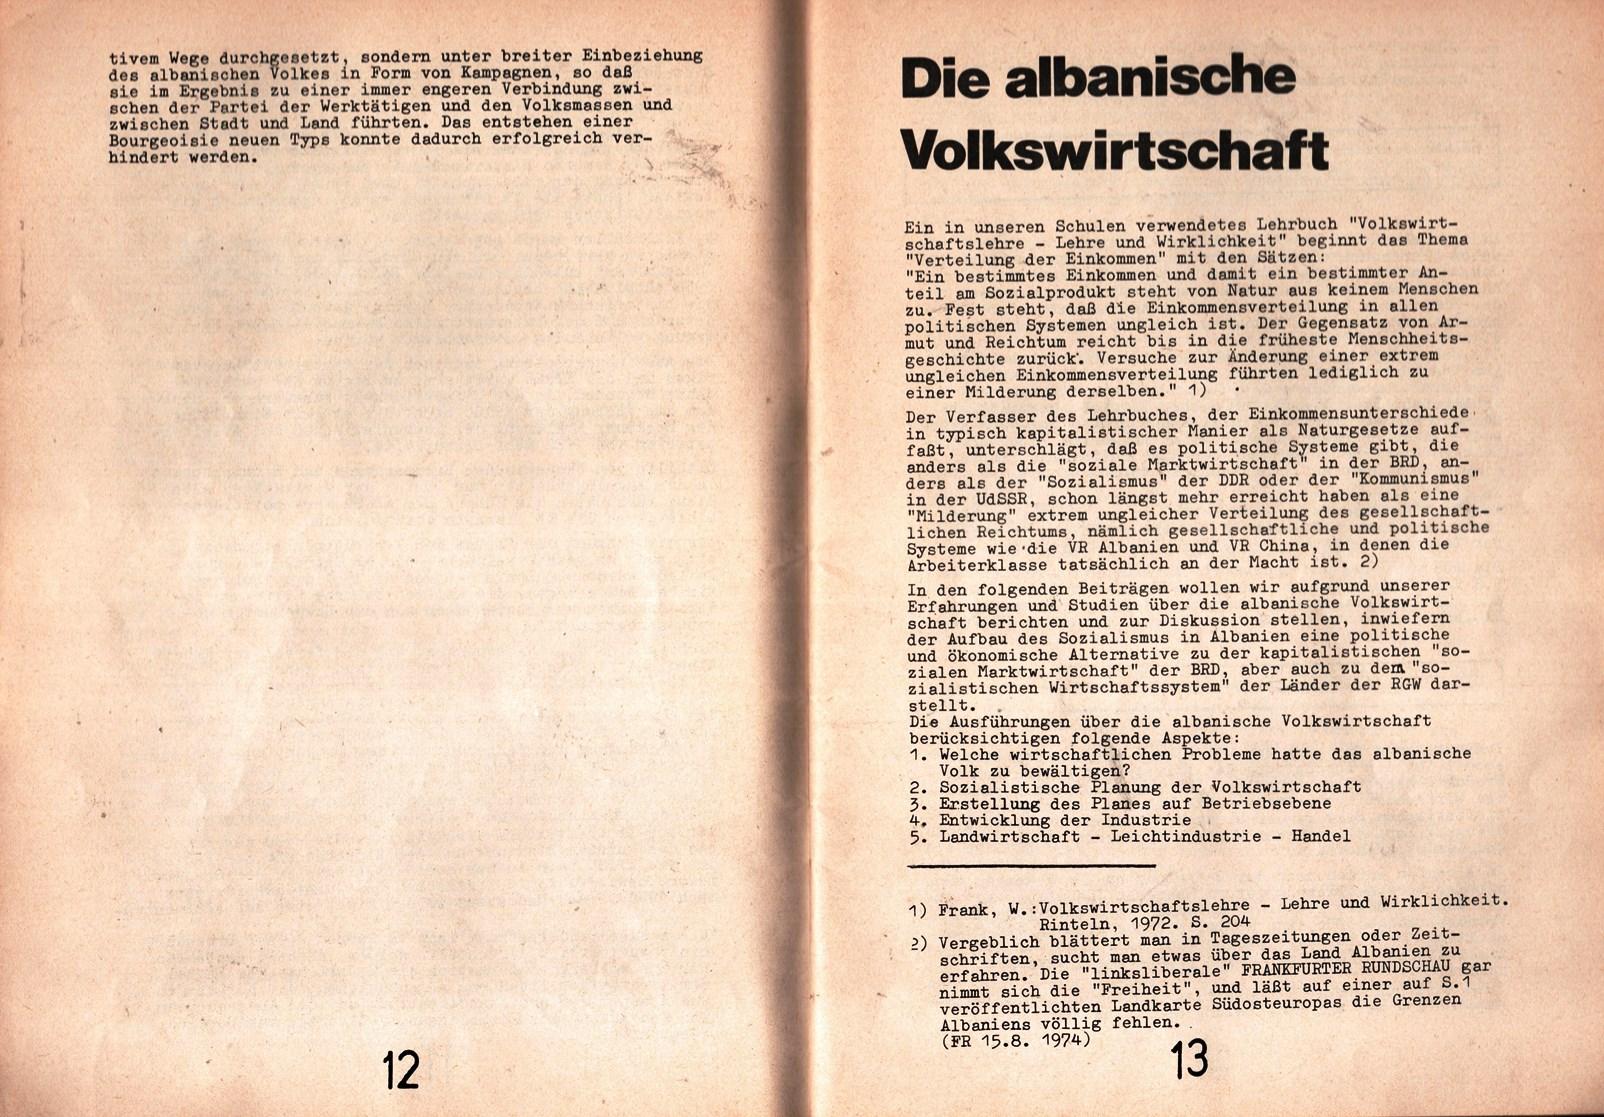 Berlin_1974_Reisebericht_Albanien_009